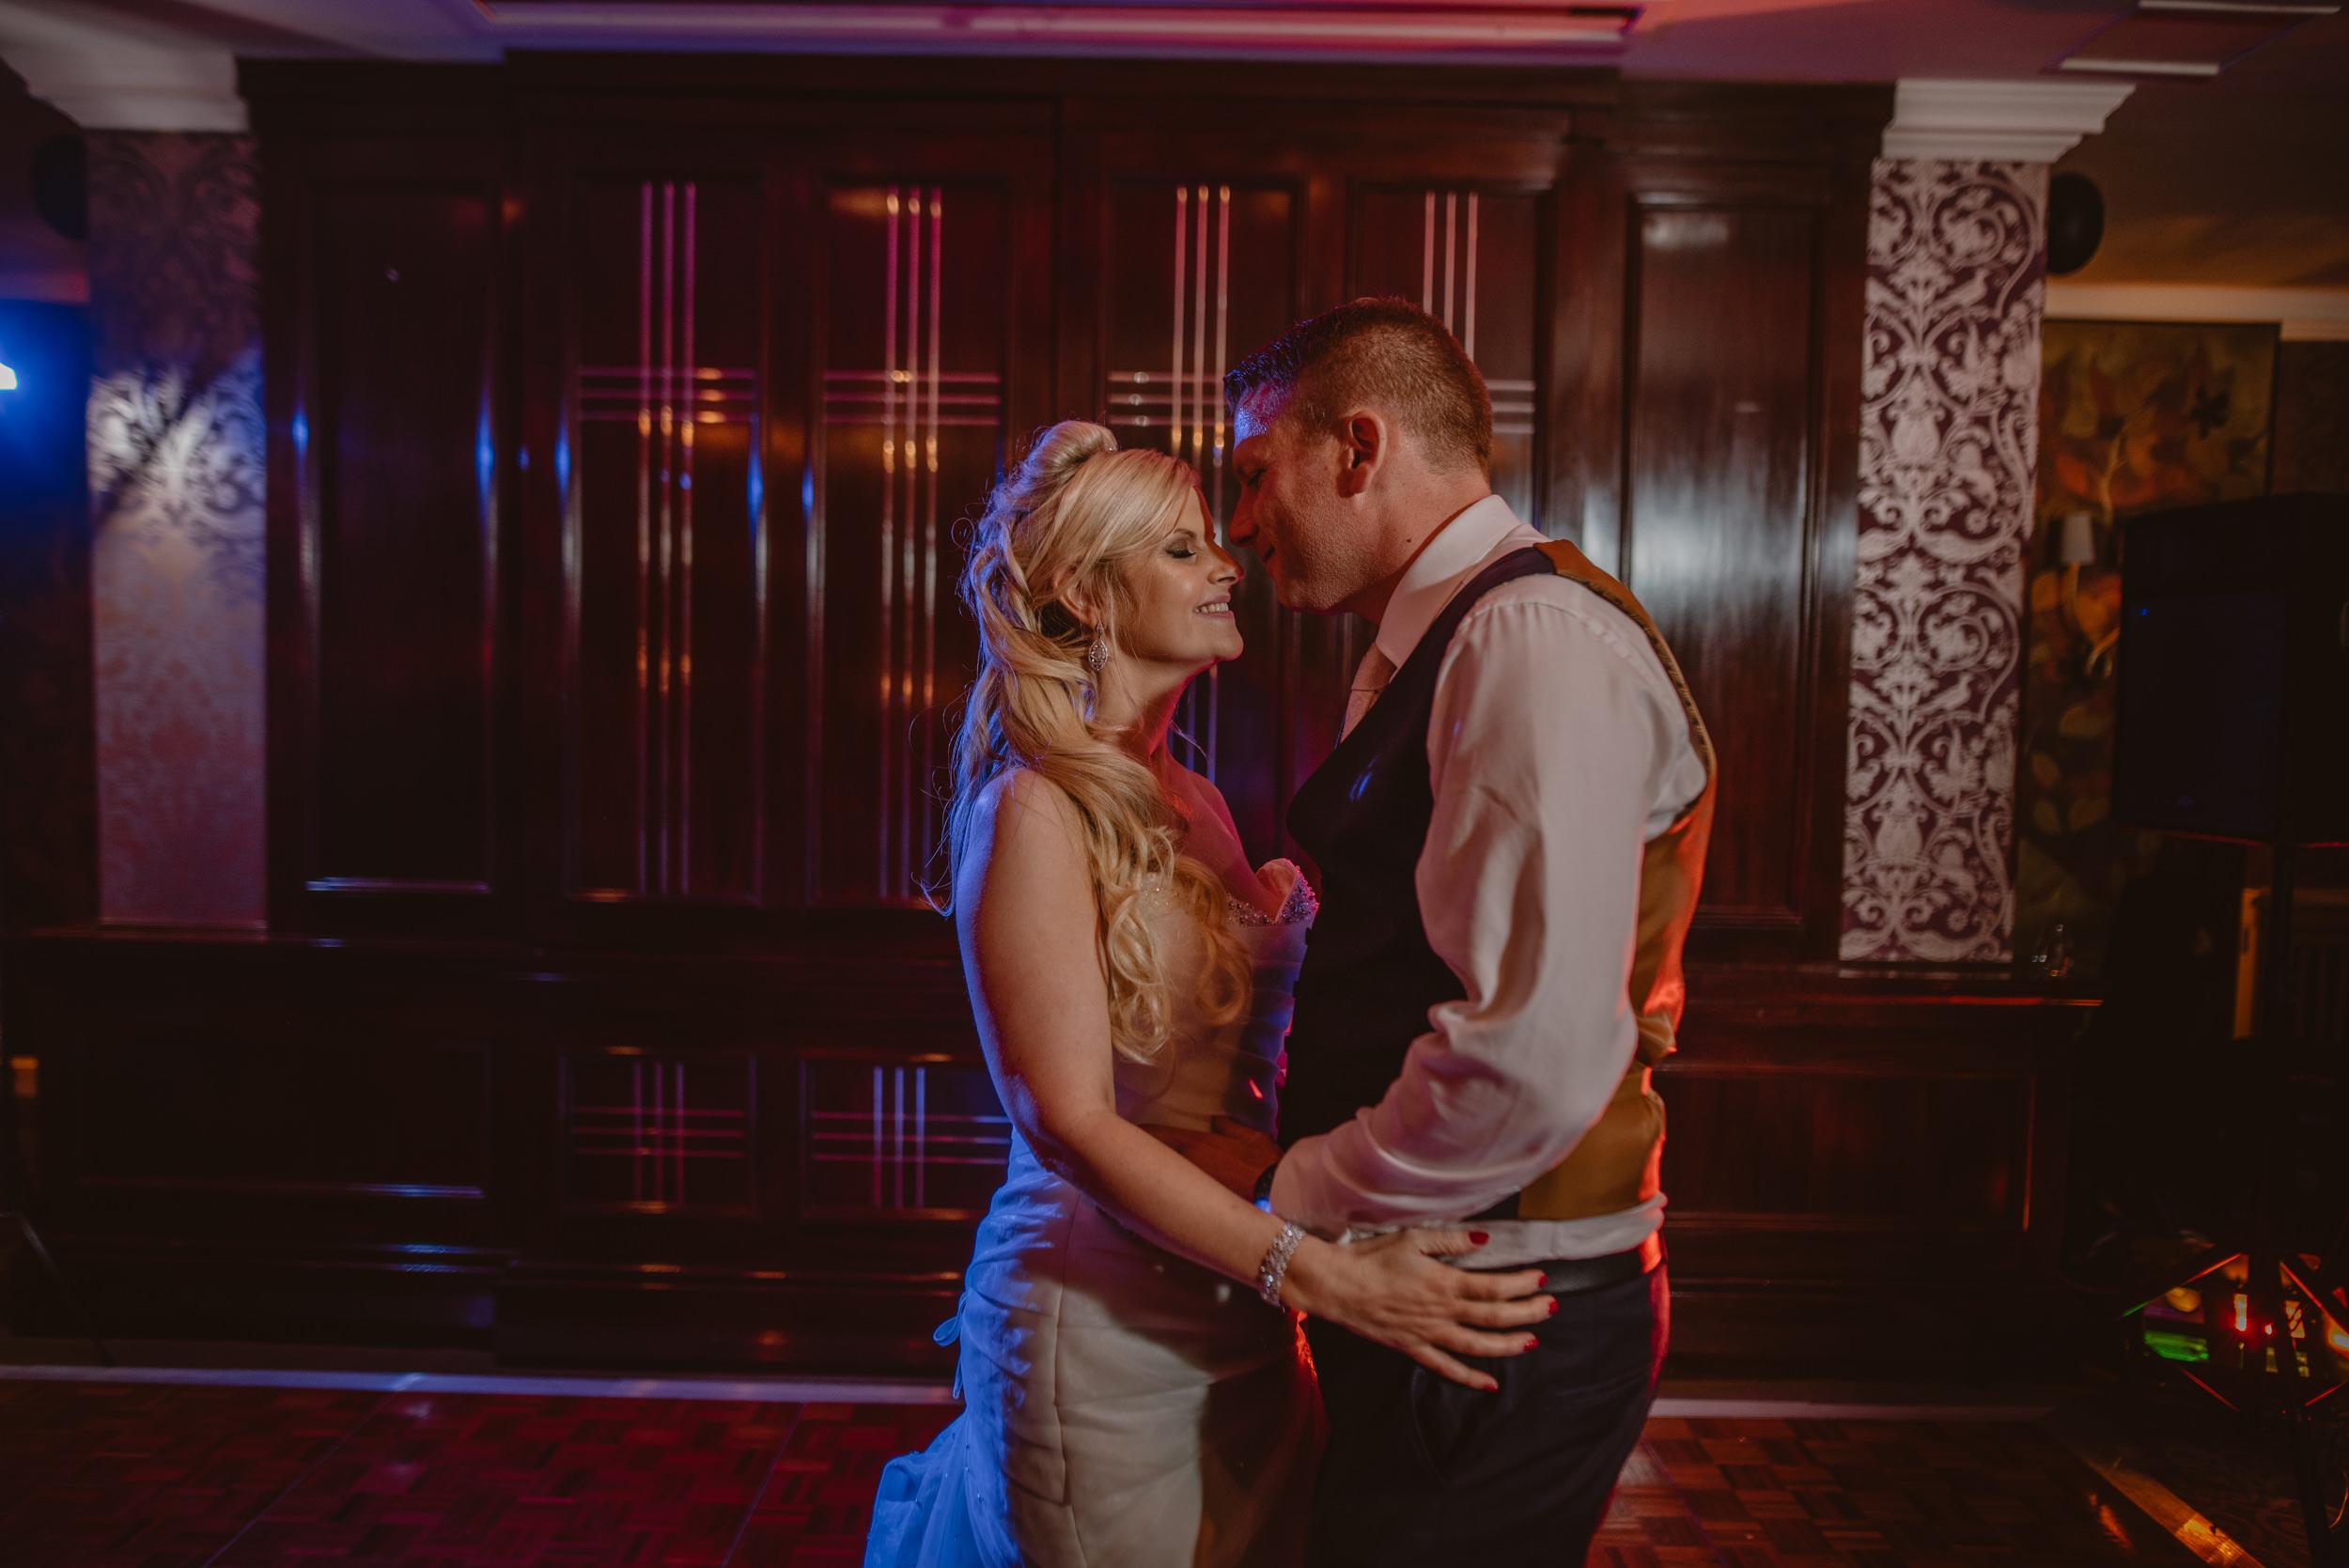 Trisha-and-Roger-wedding-The-Priory-Church-and-Chewton-Glen-Hotel-Christchurch-Manu-Mendoza-Wedding-Photography-499.jpg